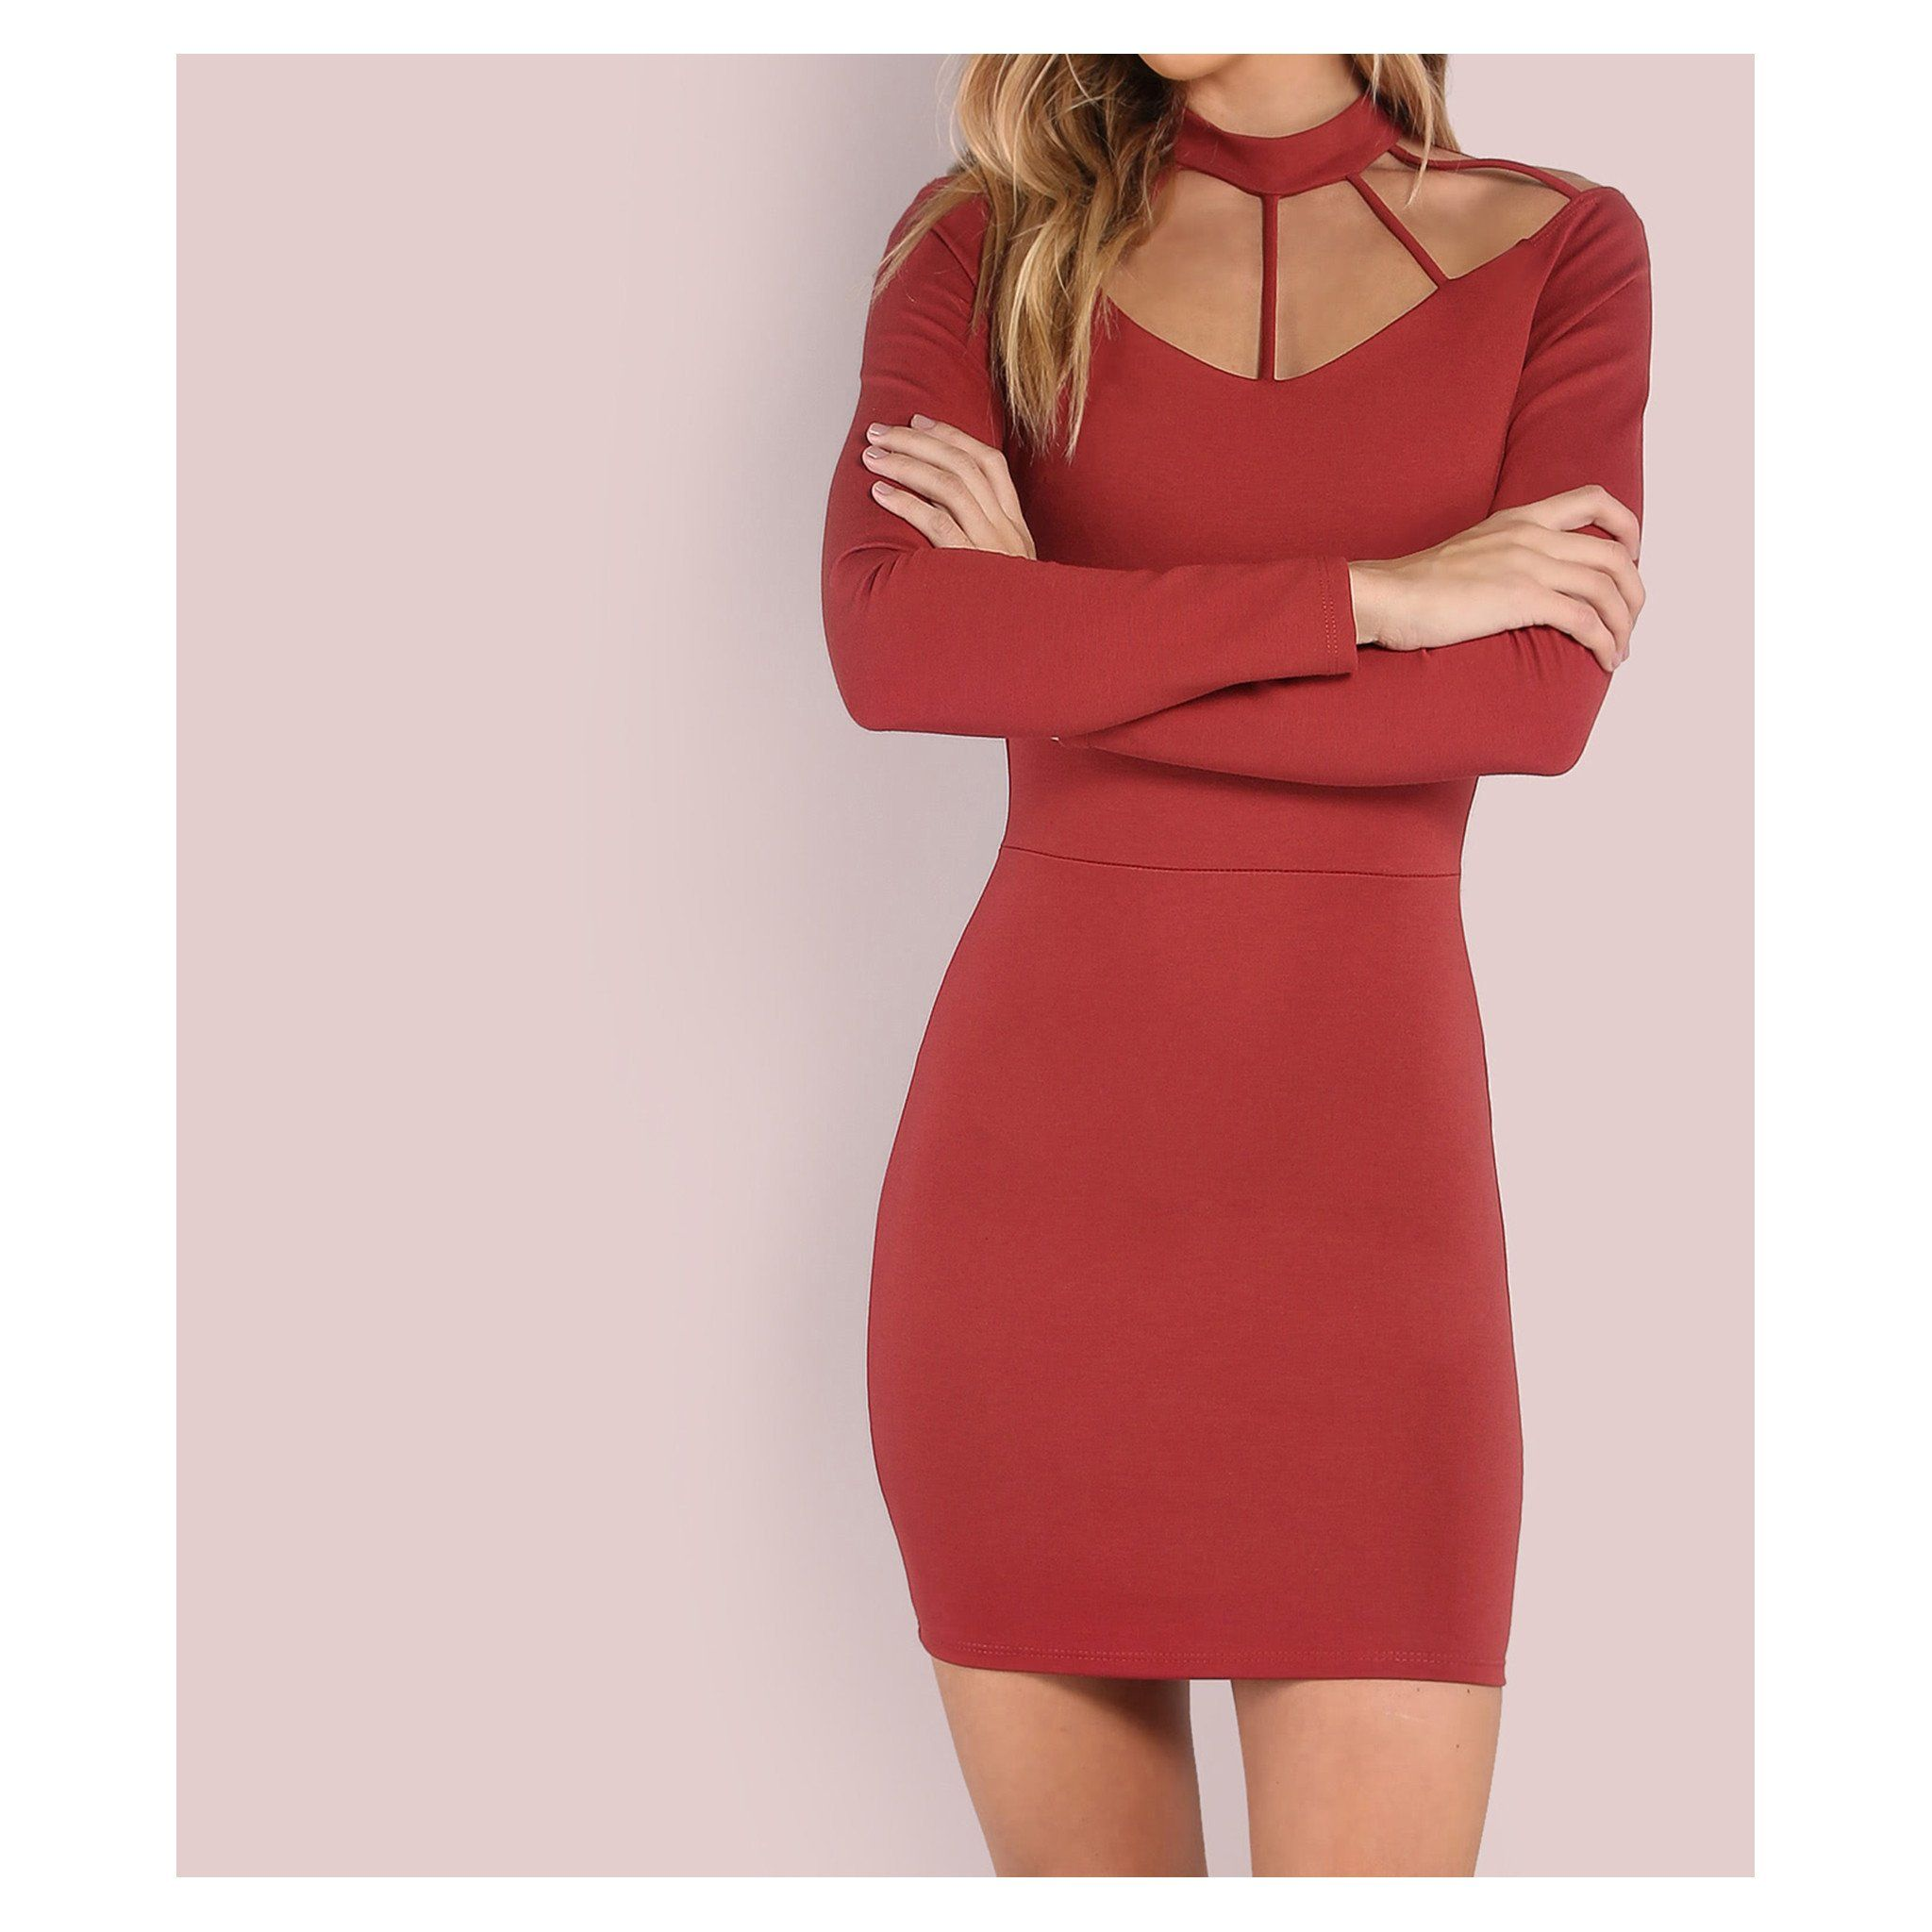 Rusty red long sleeve chocker strappy bodycon dress bodycon dress